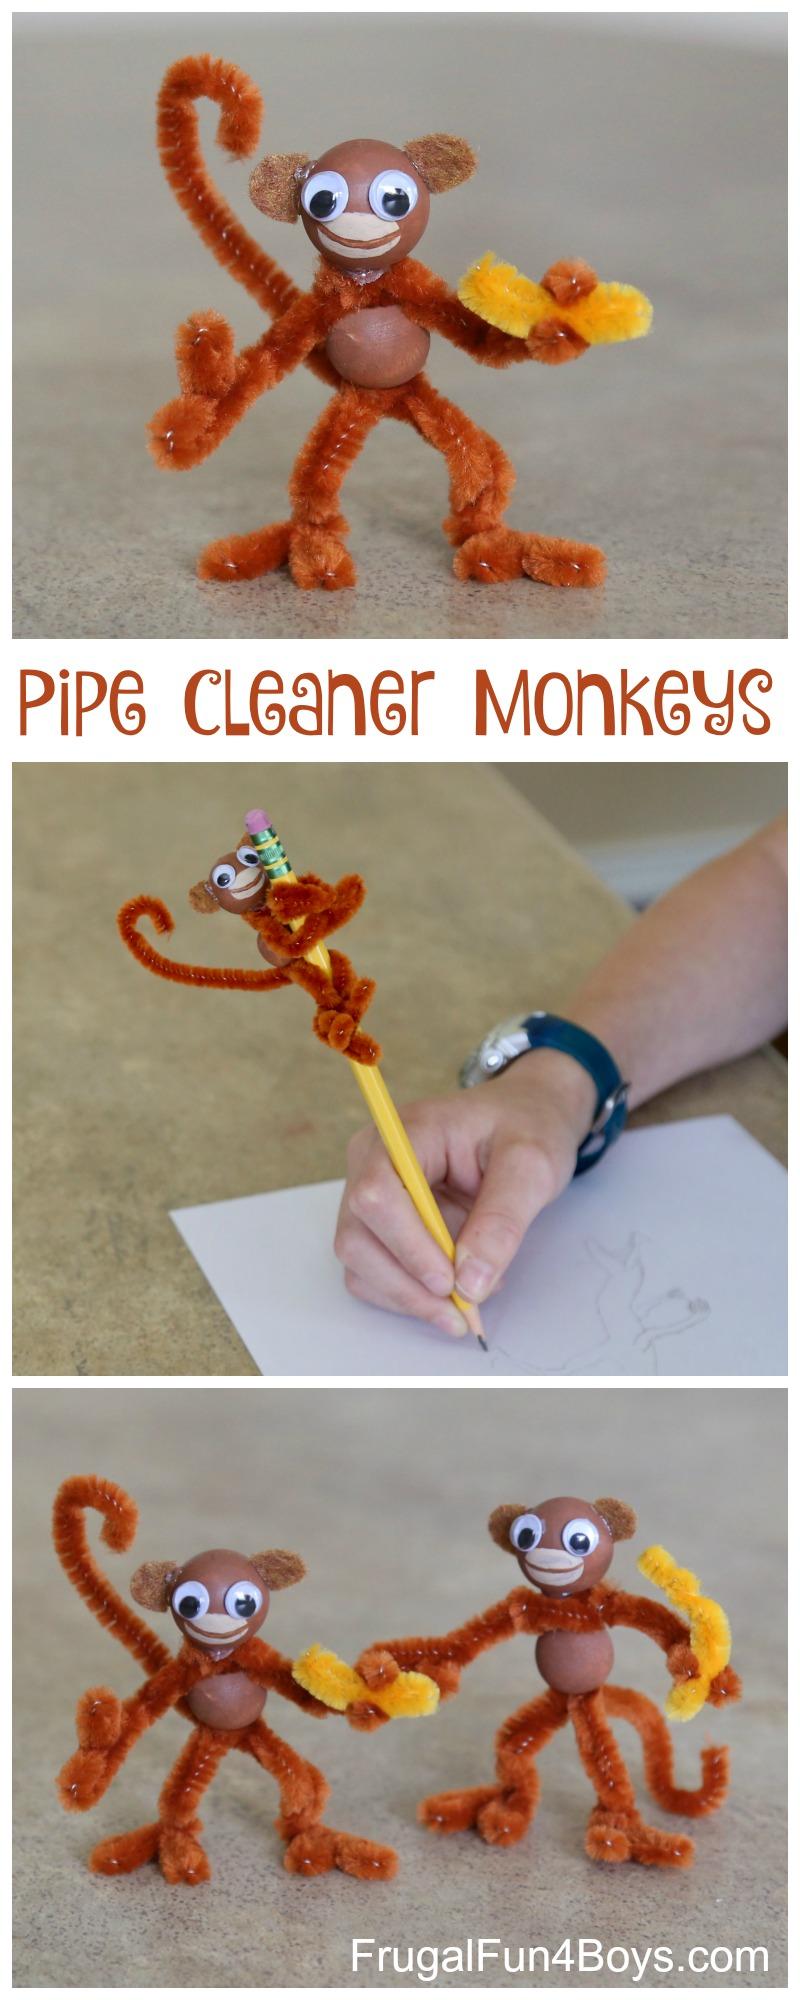 Kids Craft: Pipe Cleaner Monkeys